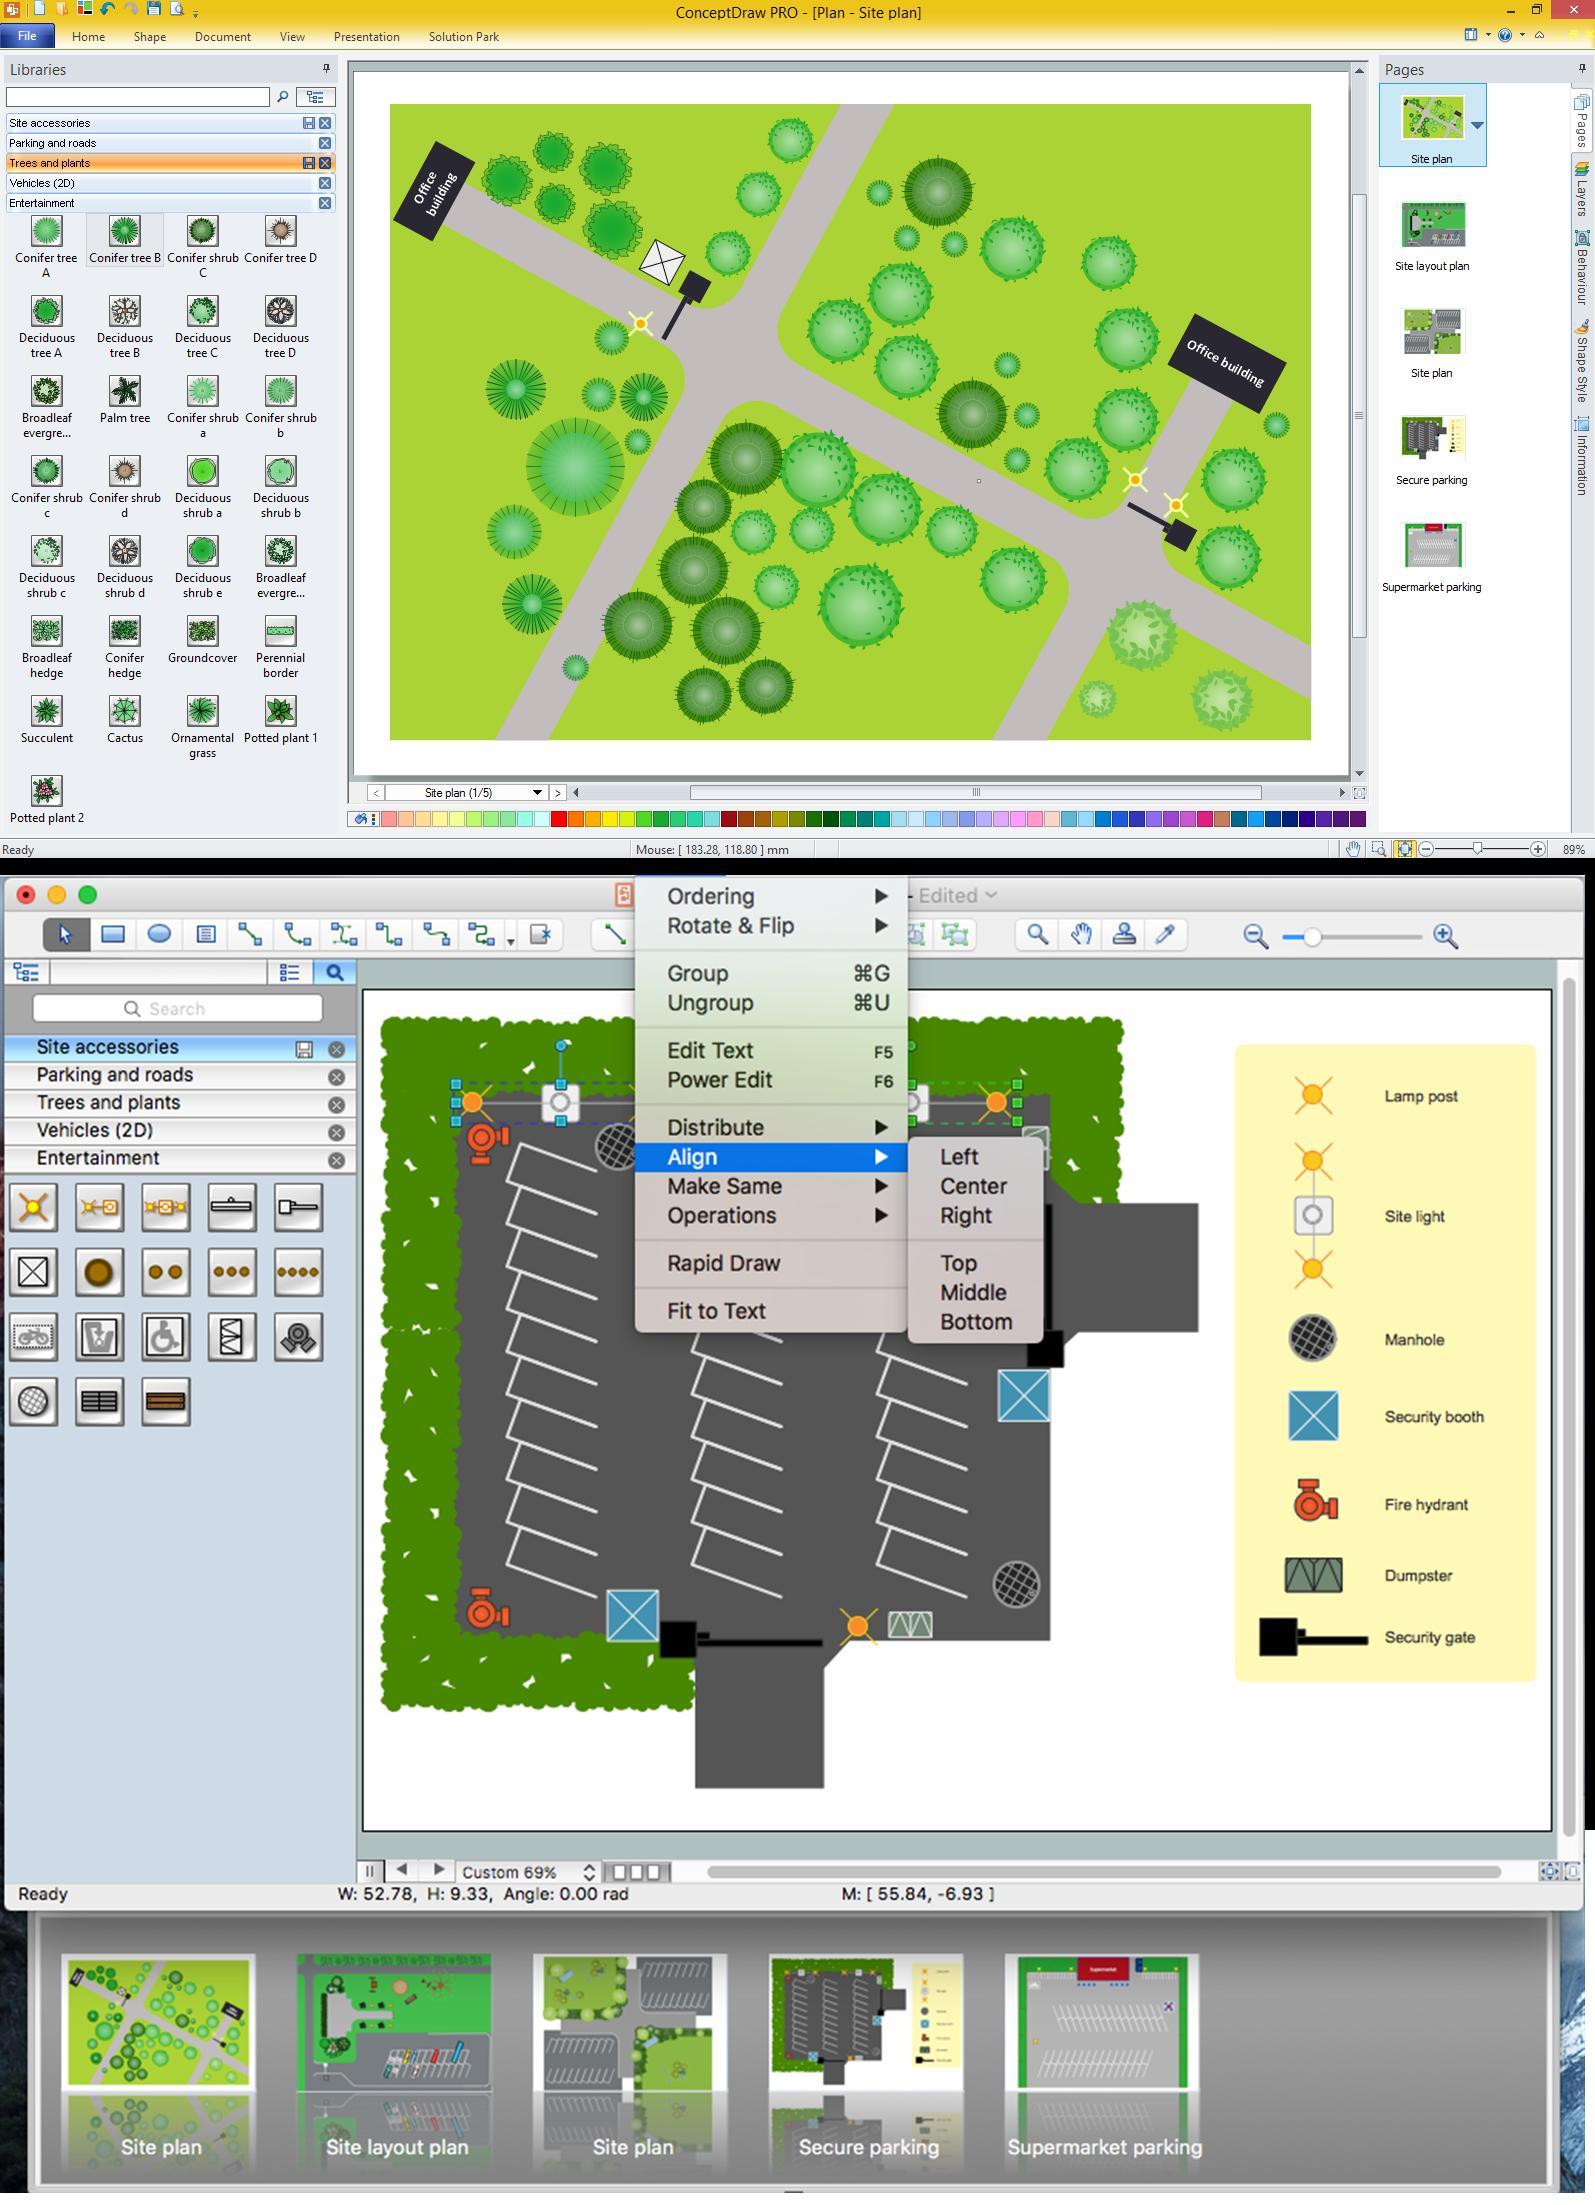 Design Element: Site Plan | Professional Building Drawing